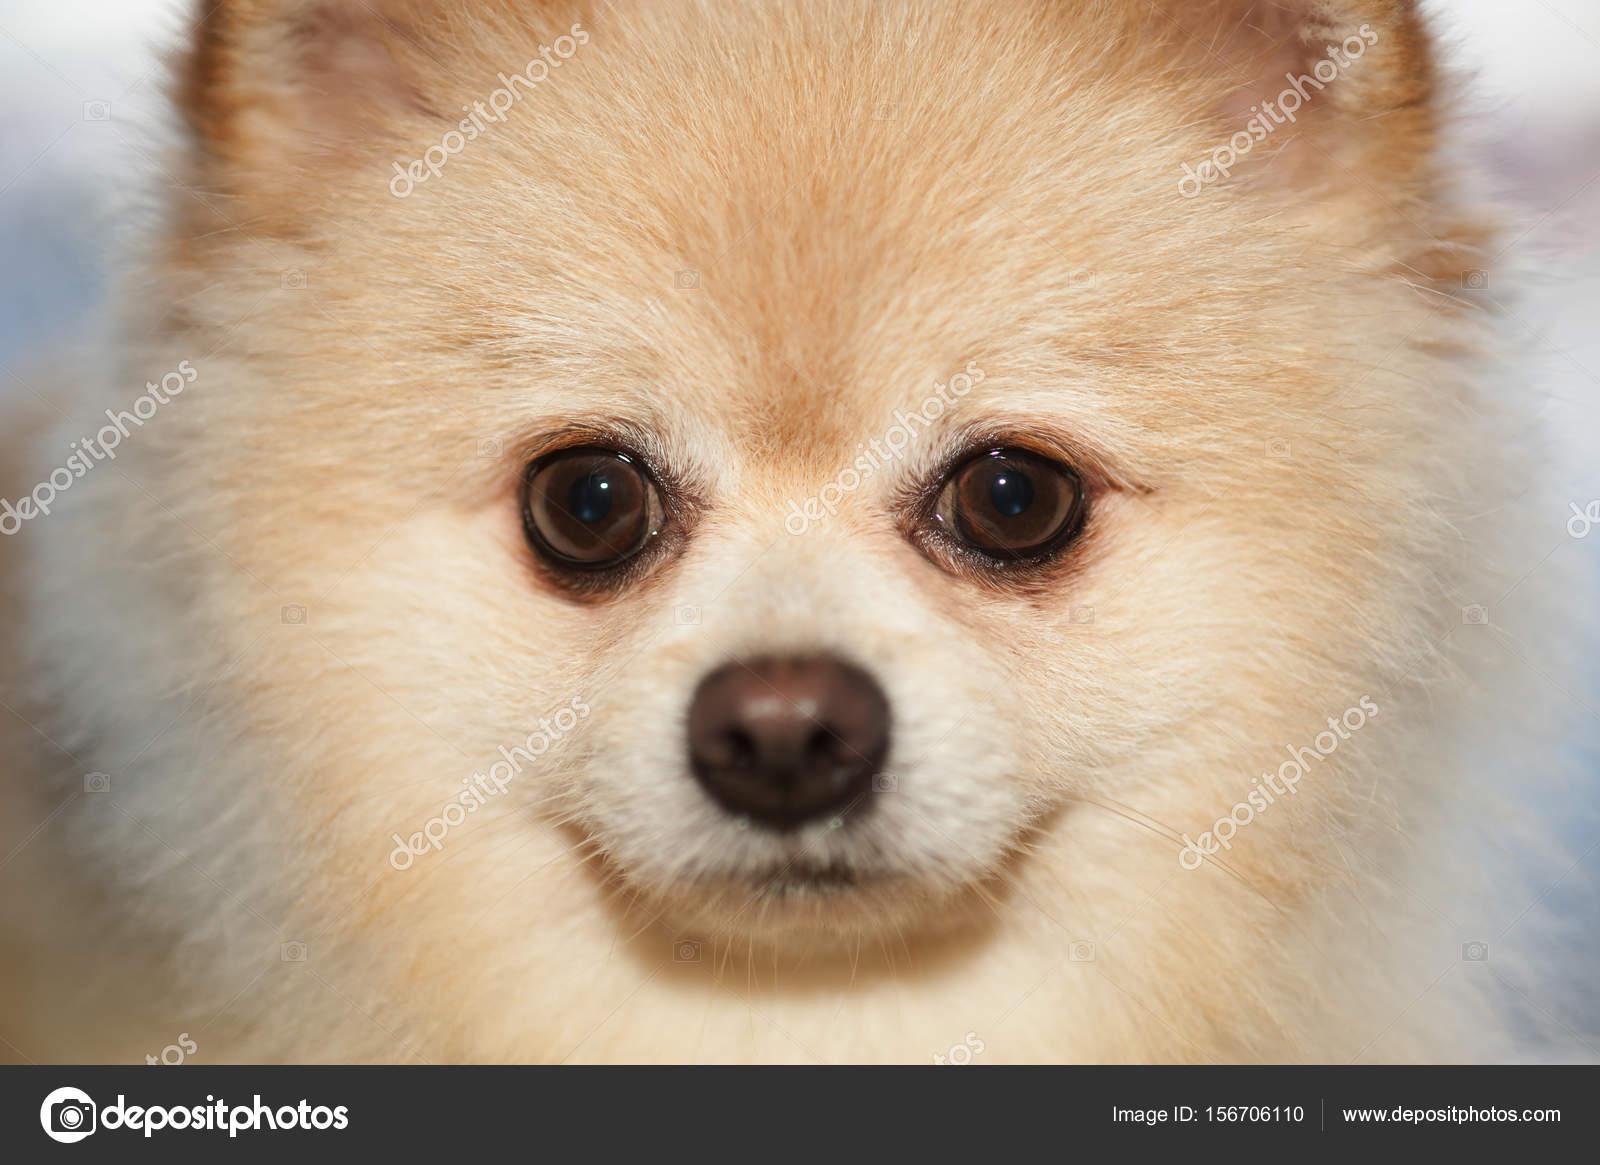 Best Pom Canine Adorable Dog - depositphotos_156706110-stock-photo-fluffy-pom-pomeranian-cute-dog  Collection_748740  .jpg